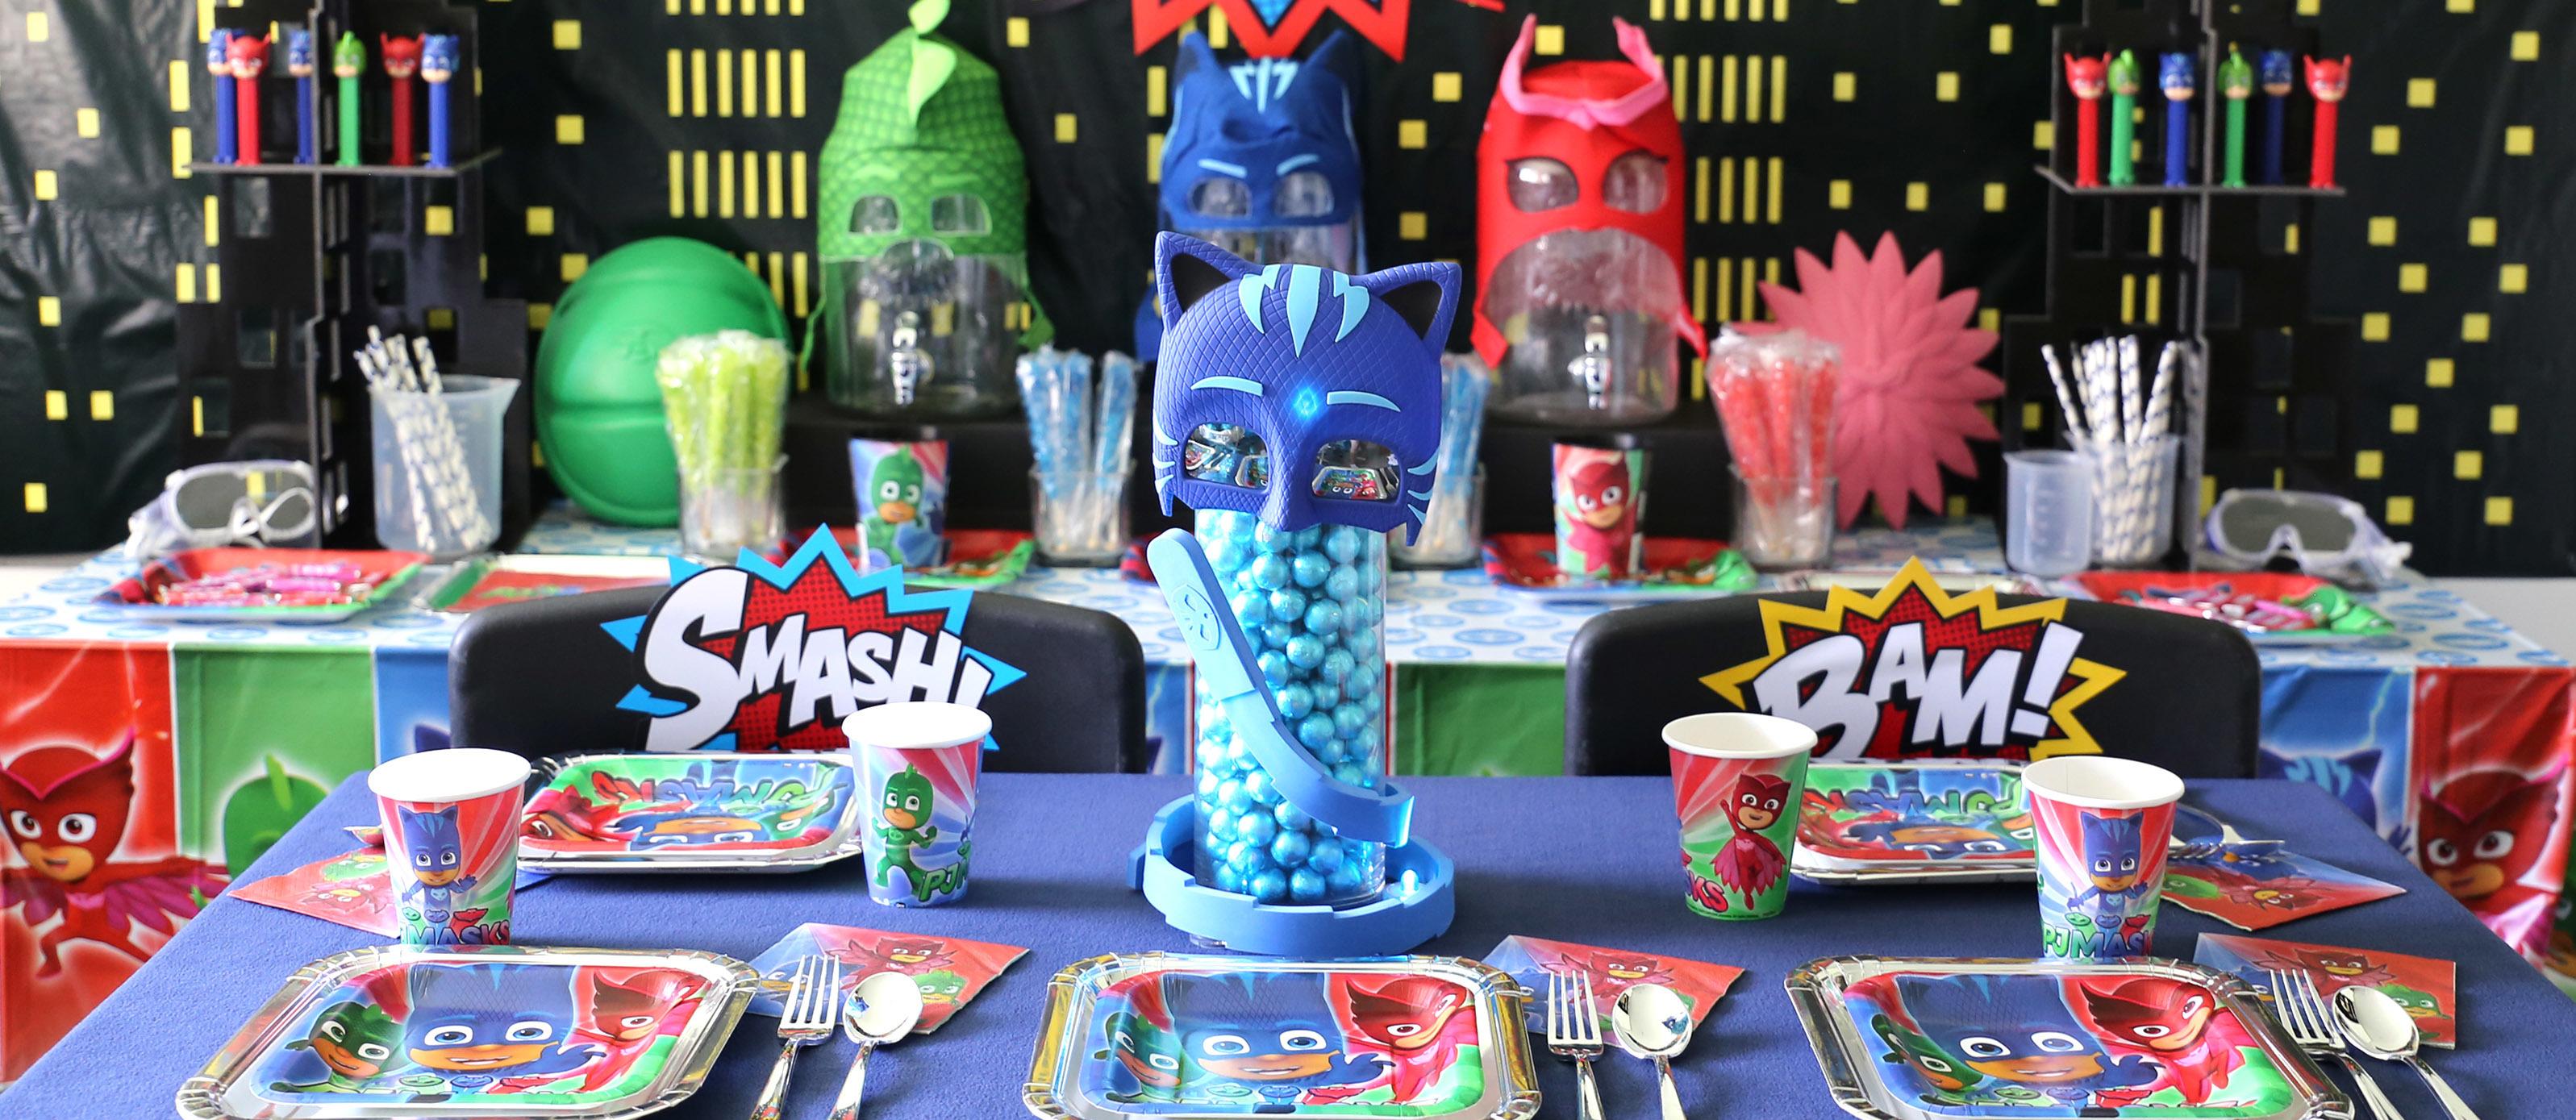 PJ Masks Pajama Heroes Paper Masks Boys Birthday Party Supplies Favors ~ 8ct.